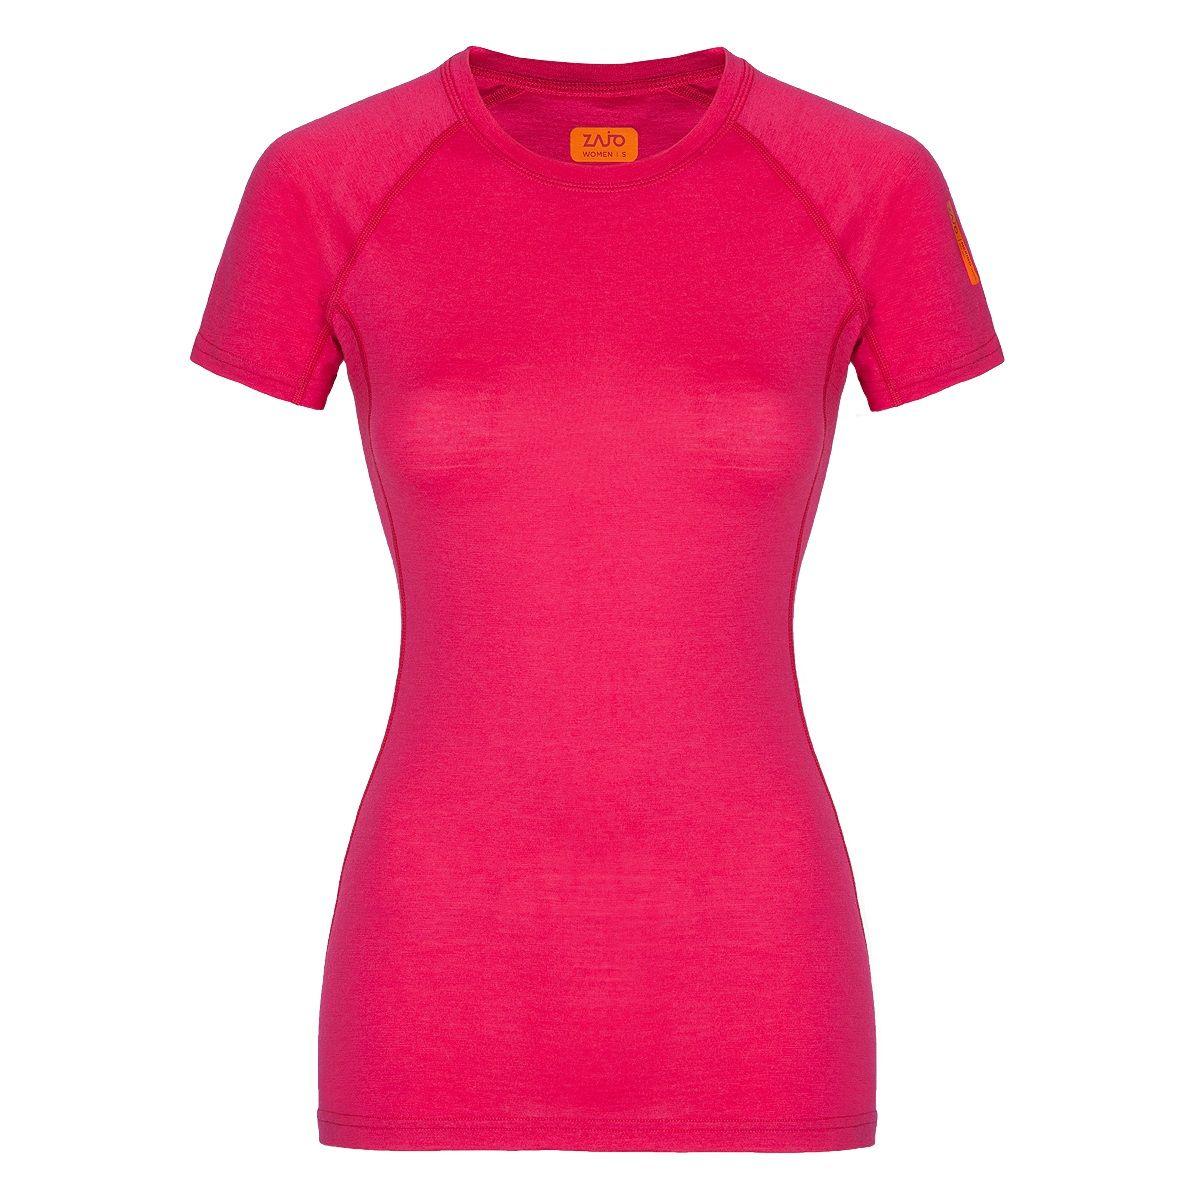 Zajo Elsa Merino W T-shirt SS gray XL